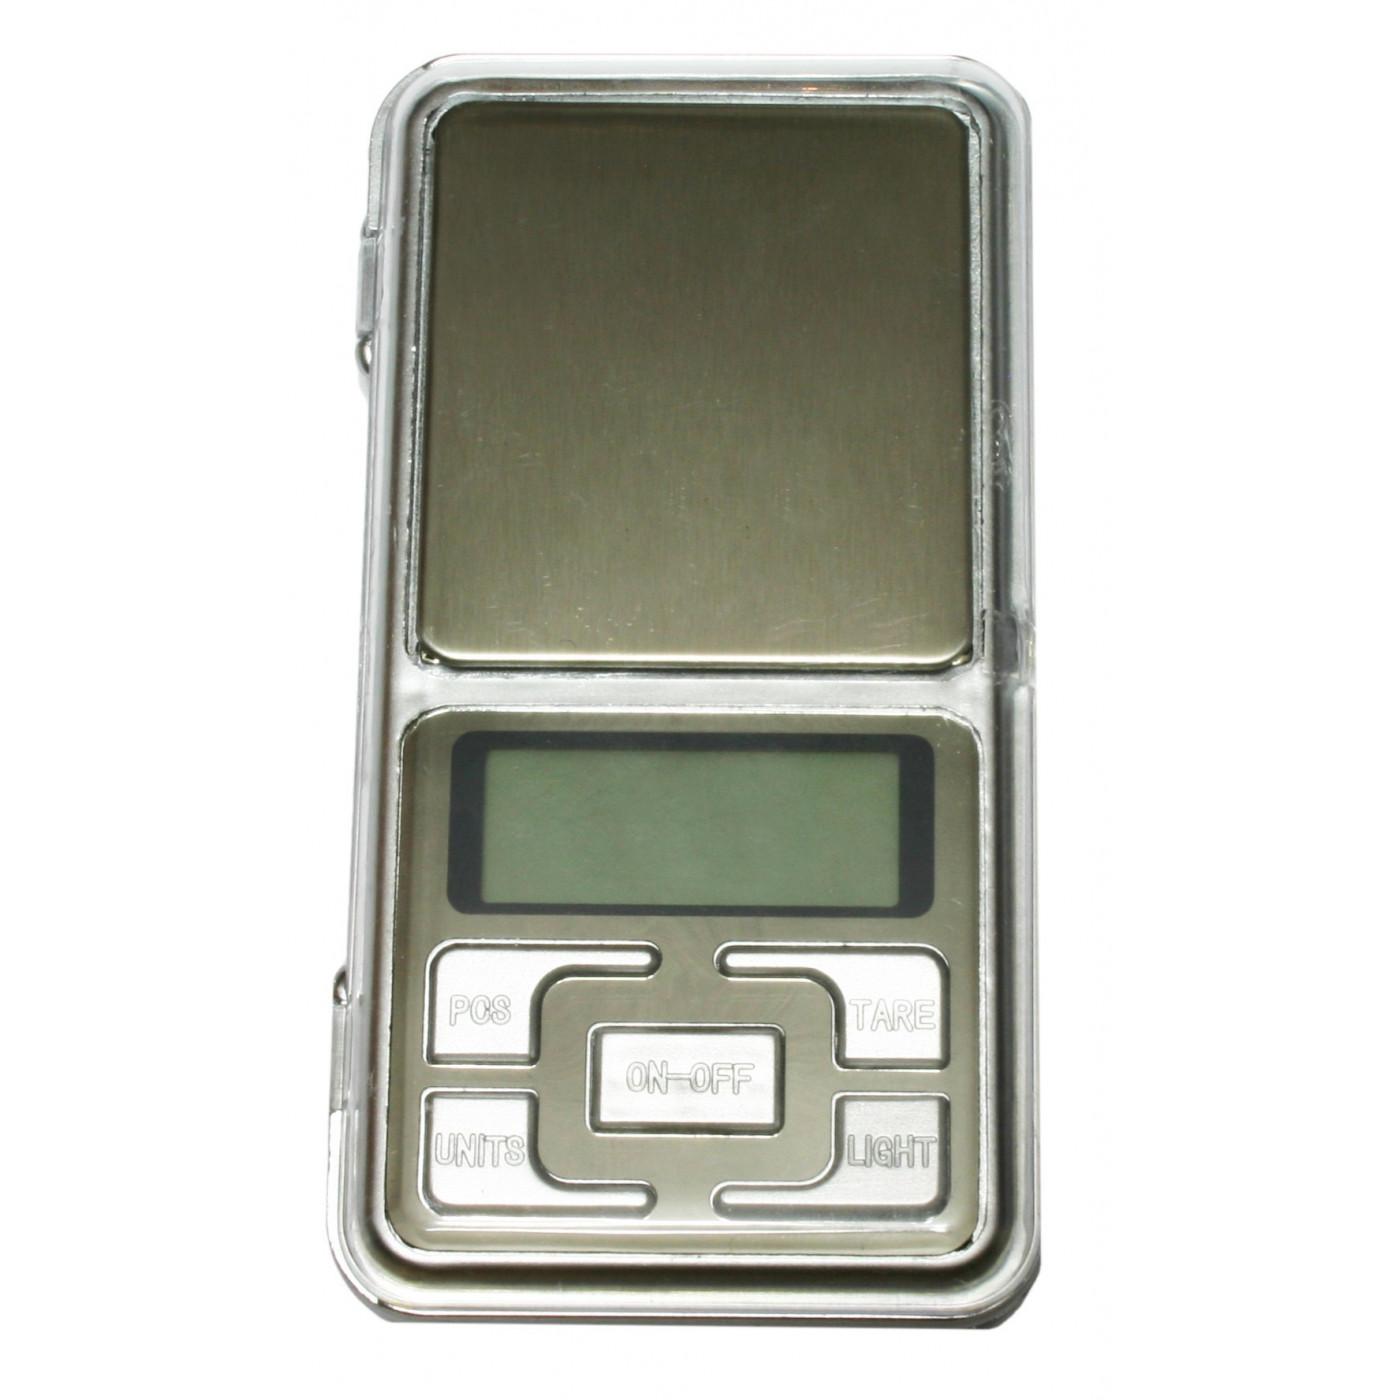 Mini digital scale